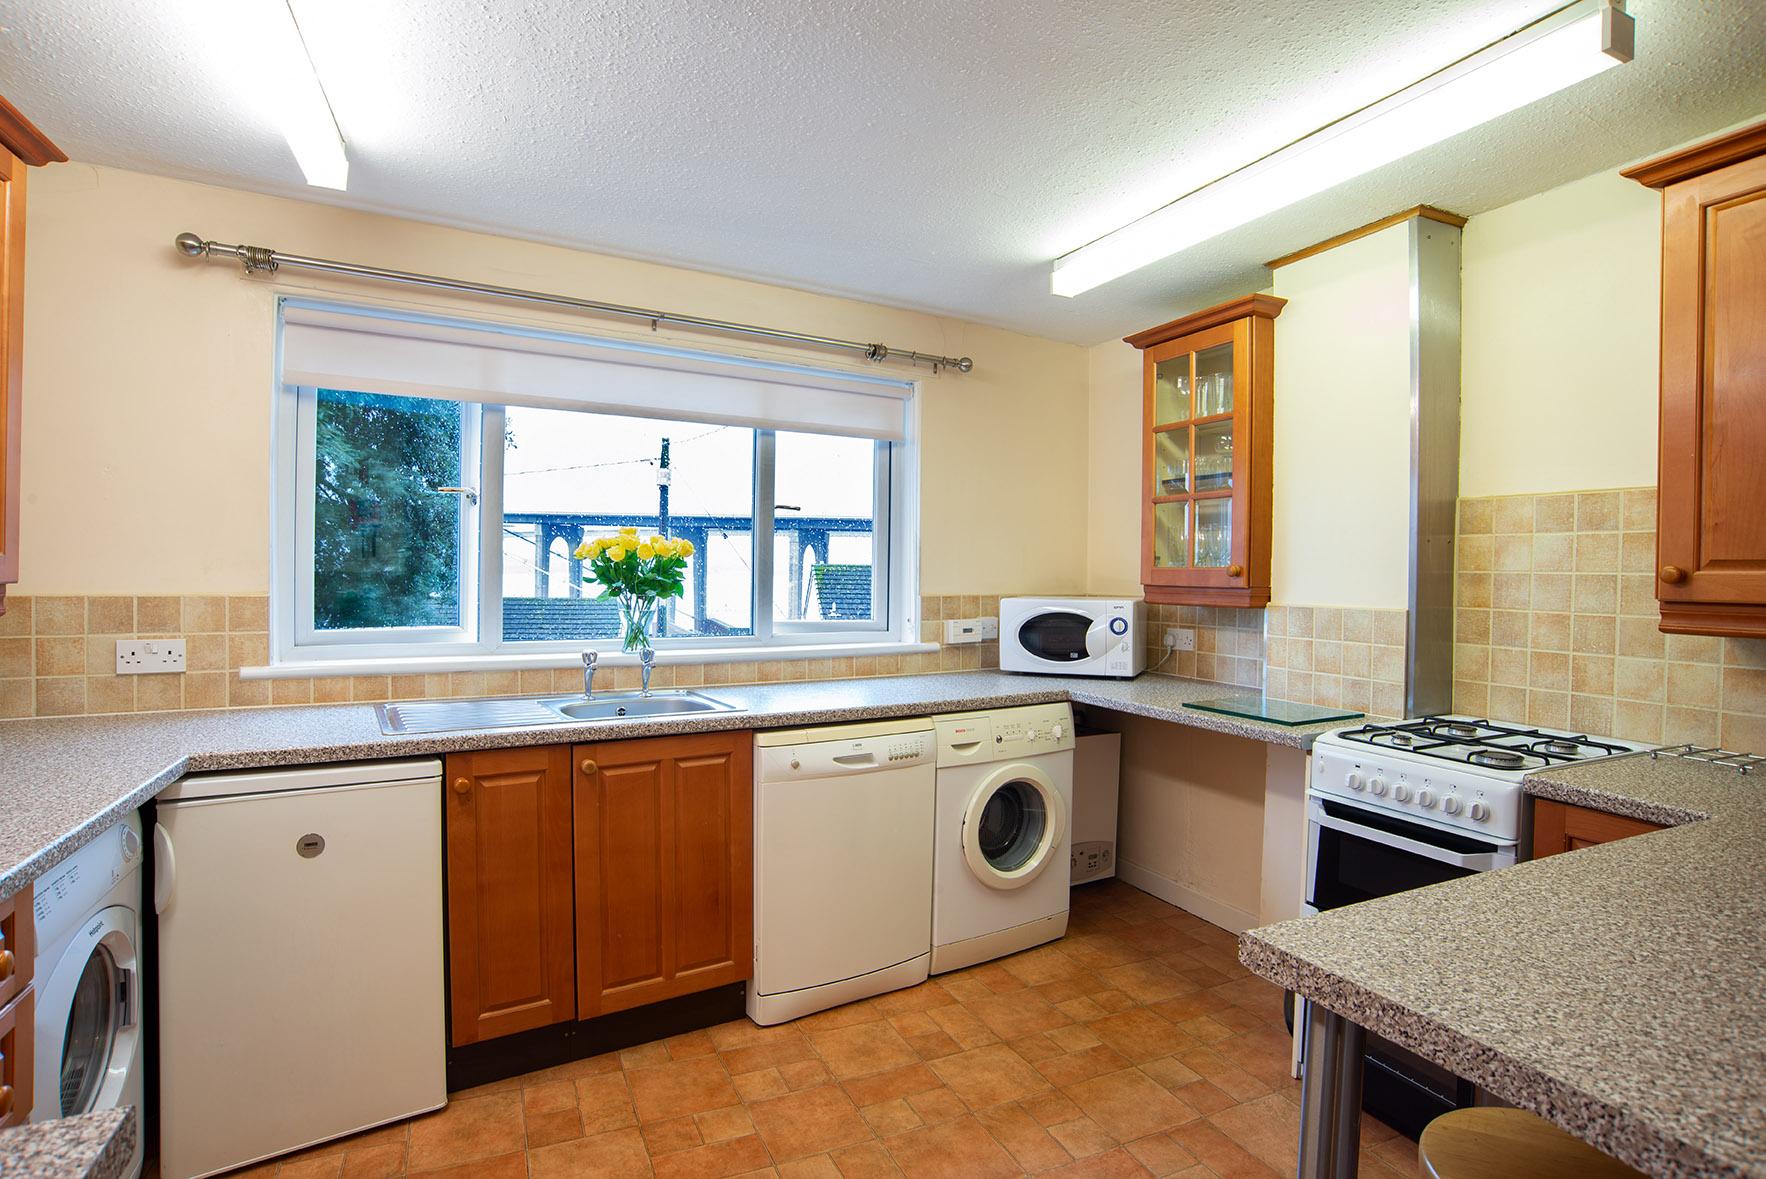 Kitchen at The Lodge, Crossgates, Dunfermline